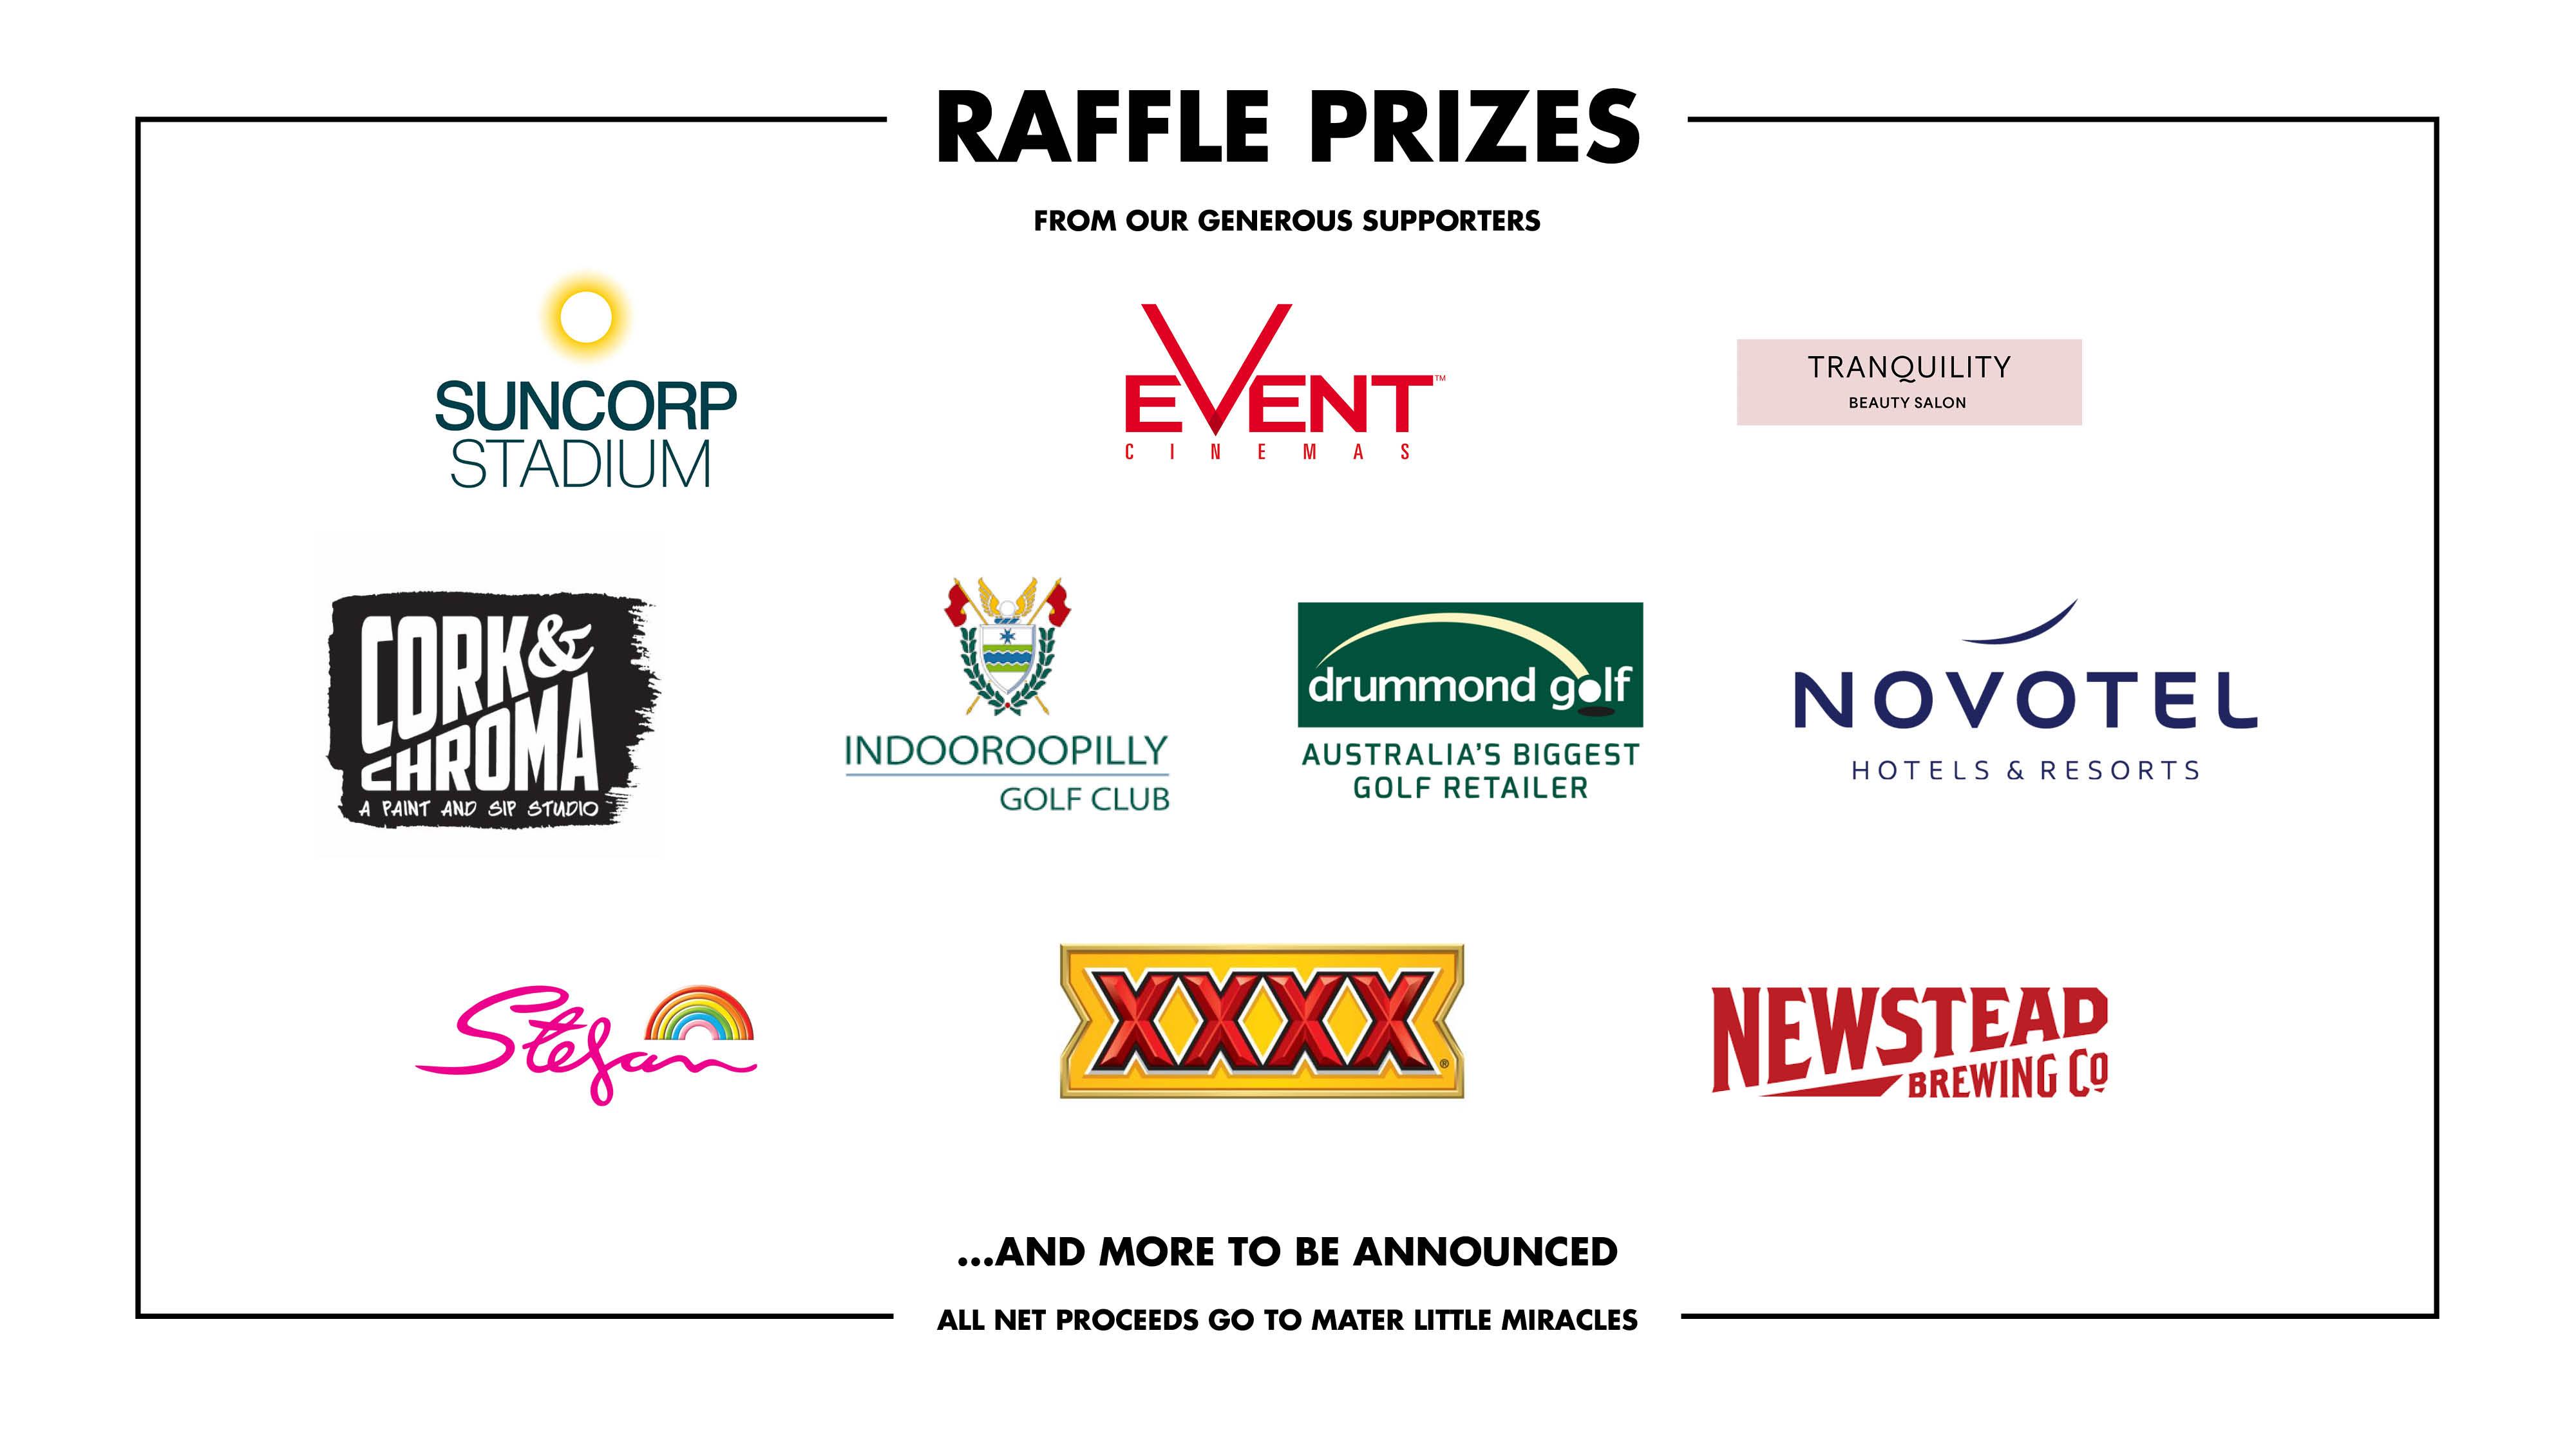 dozzi-raffle-prizes